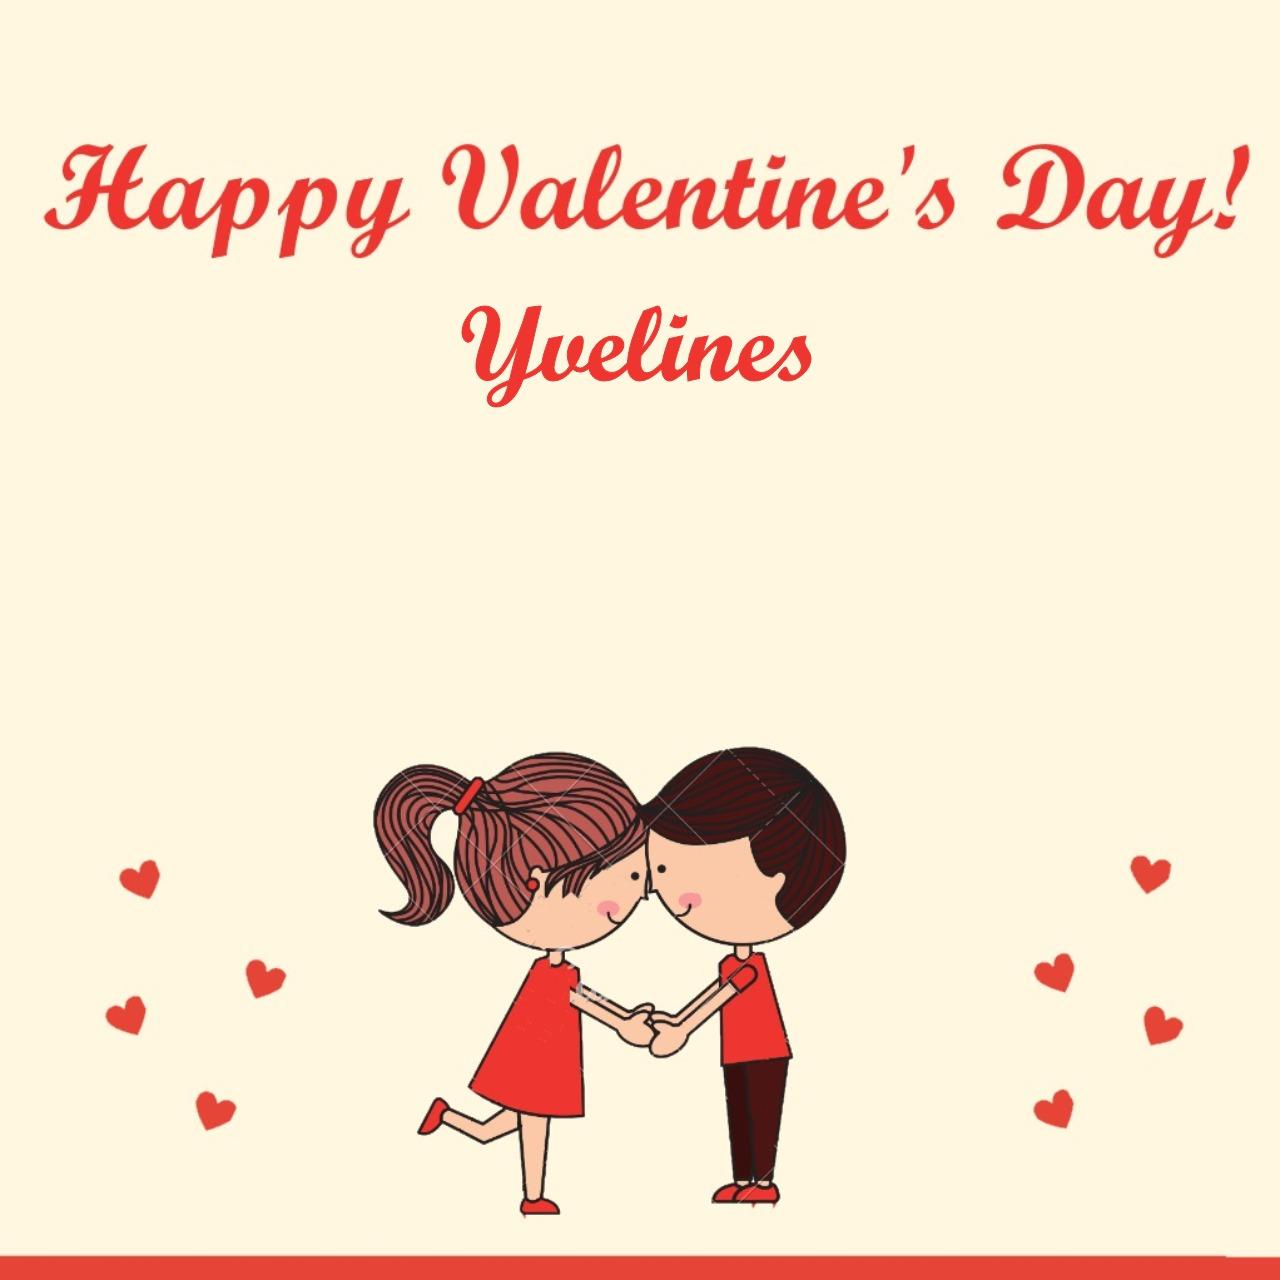 Yvelines Dating Site